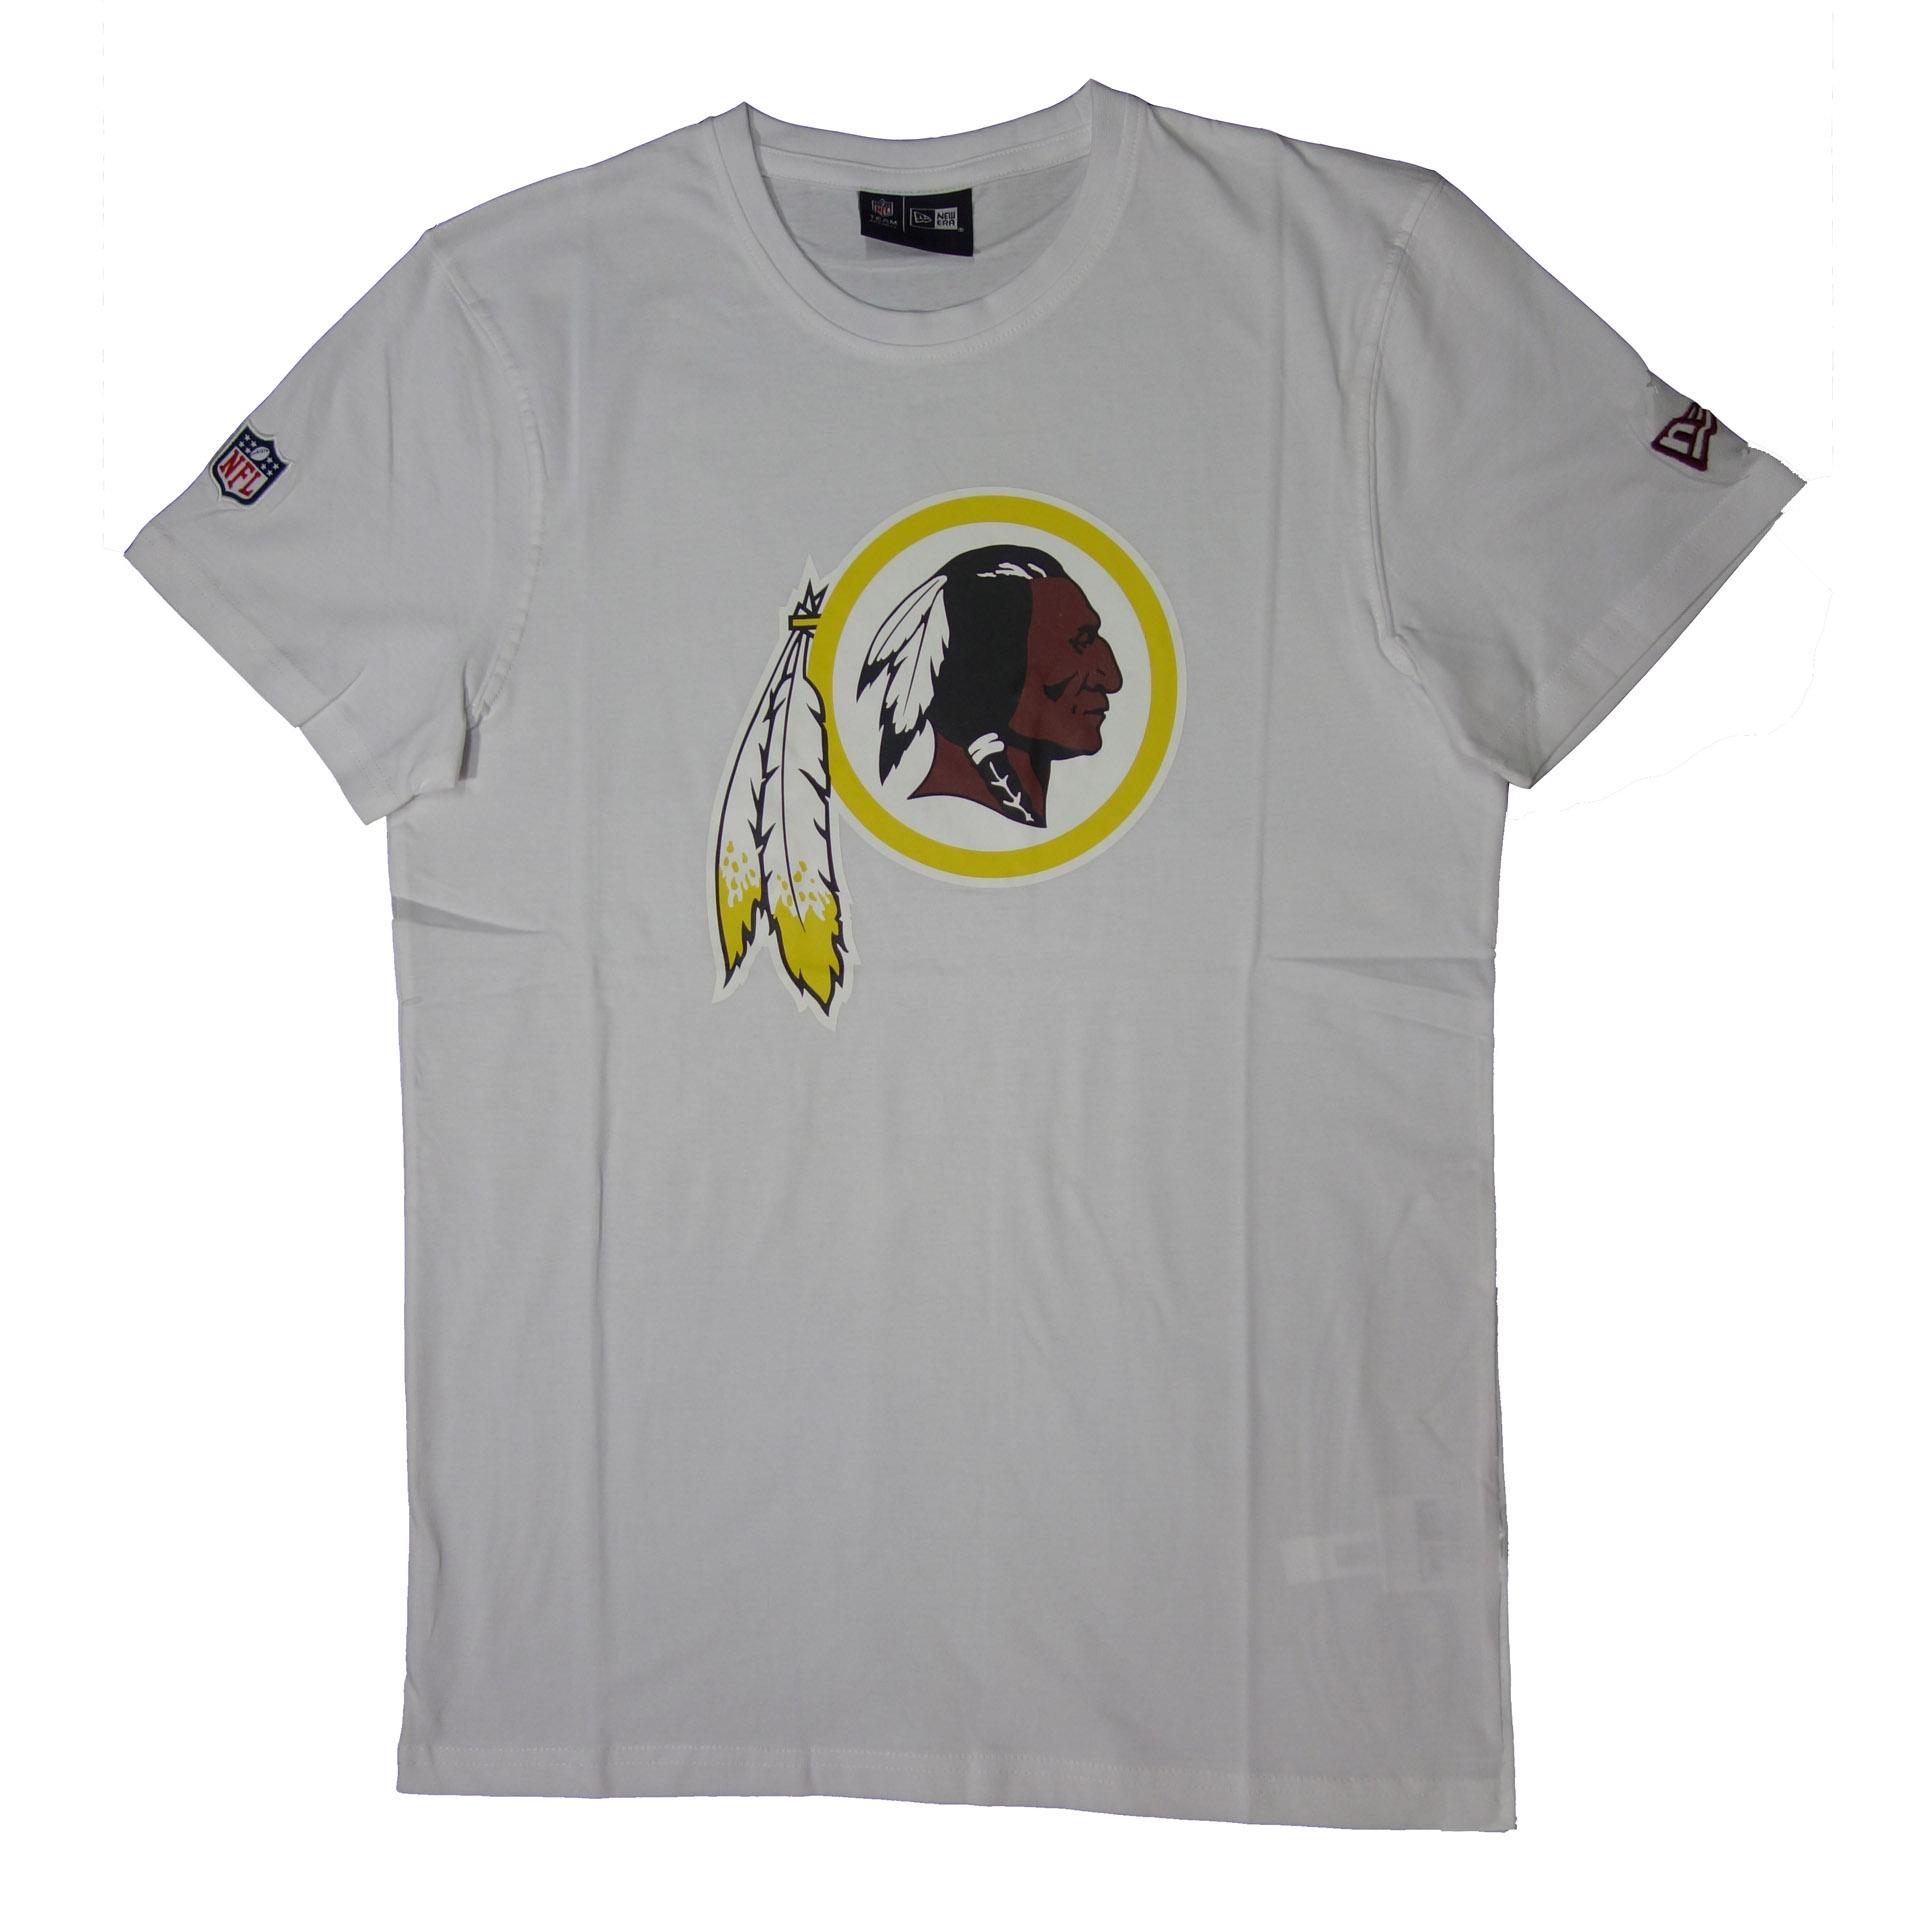 NFL T-Shirt Washington Football Team  Redskins